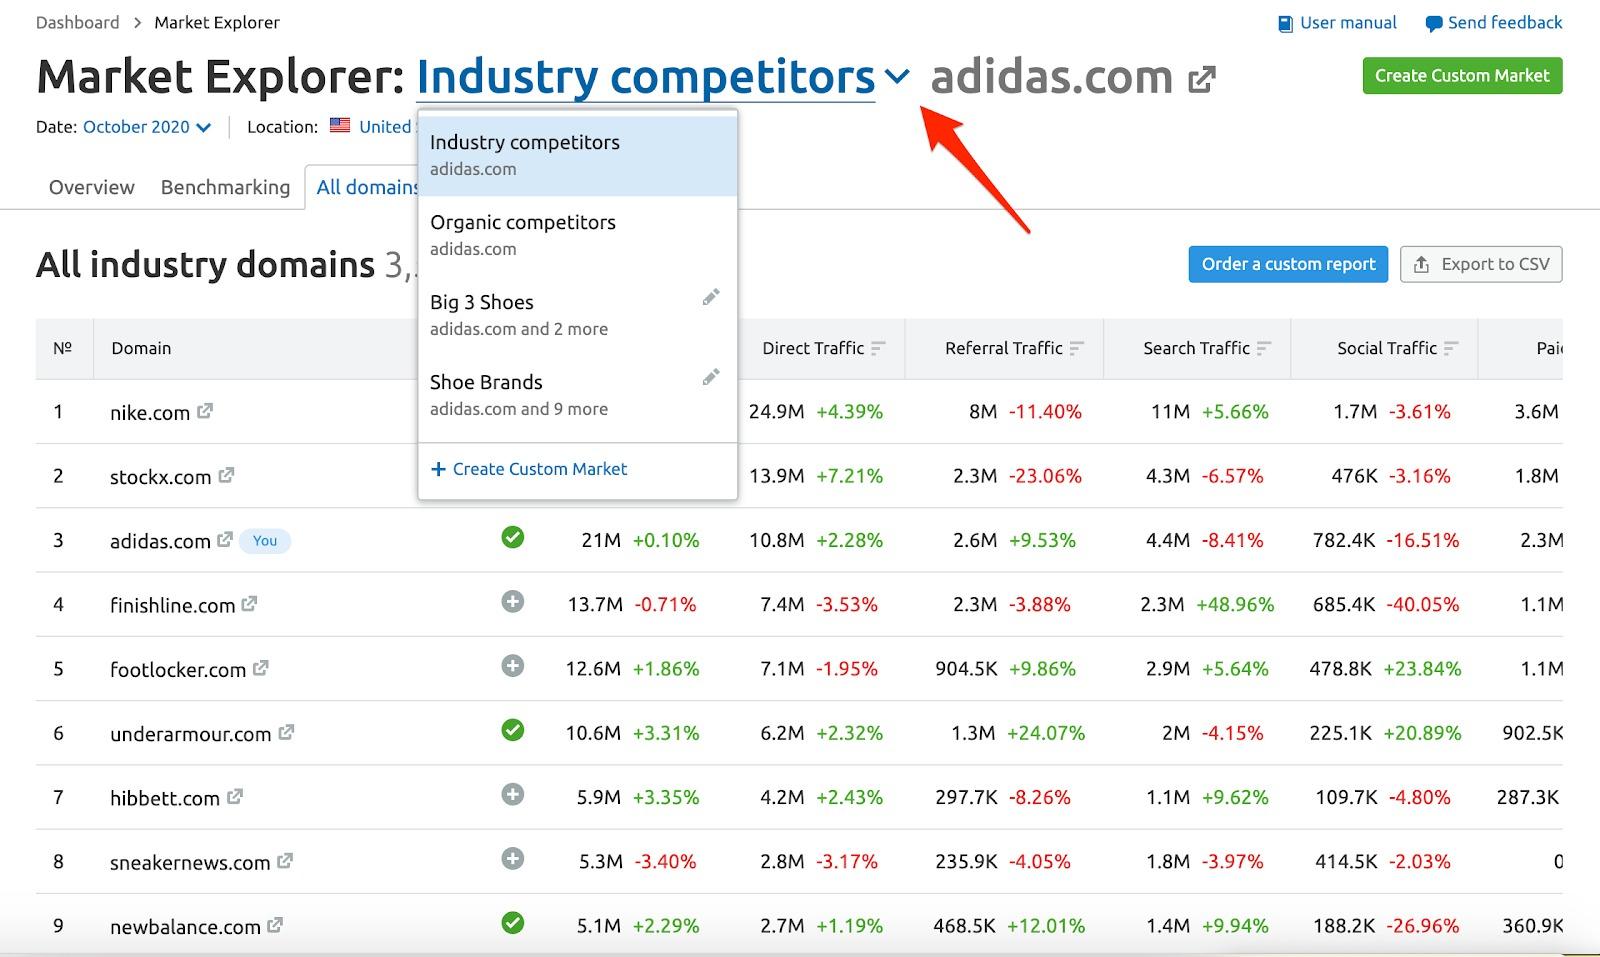 Market Explorer All Domains Report image 2